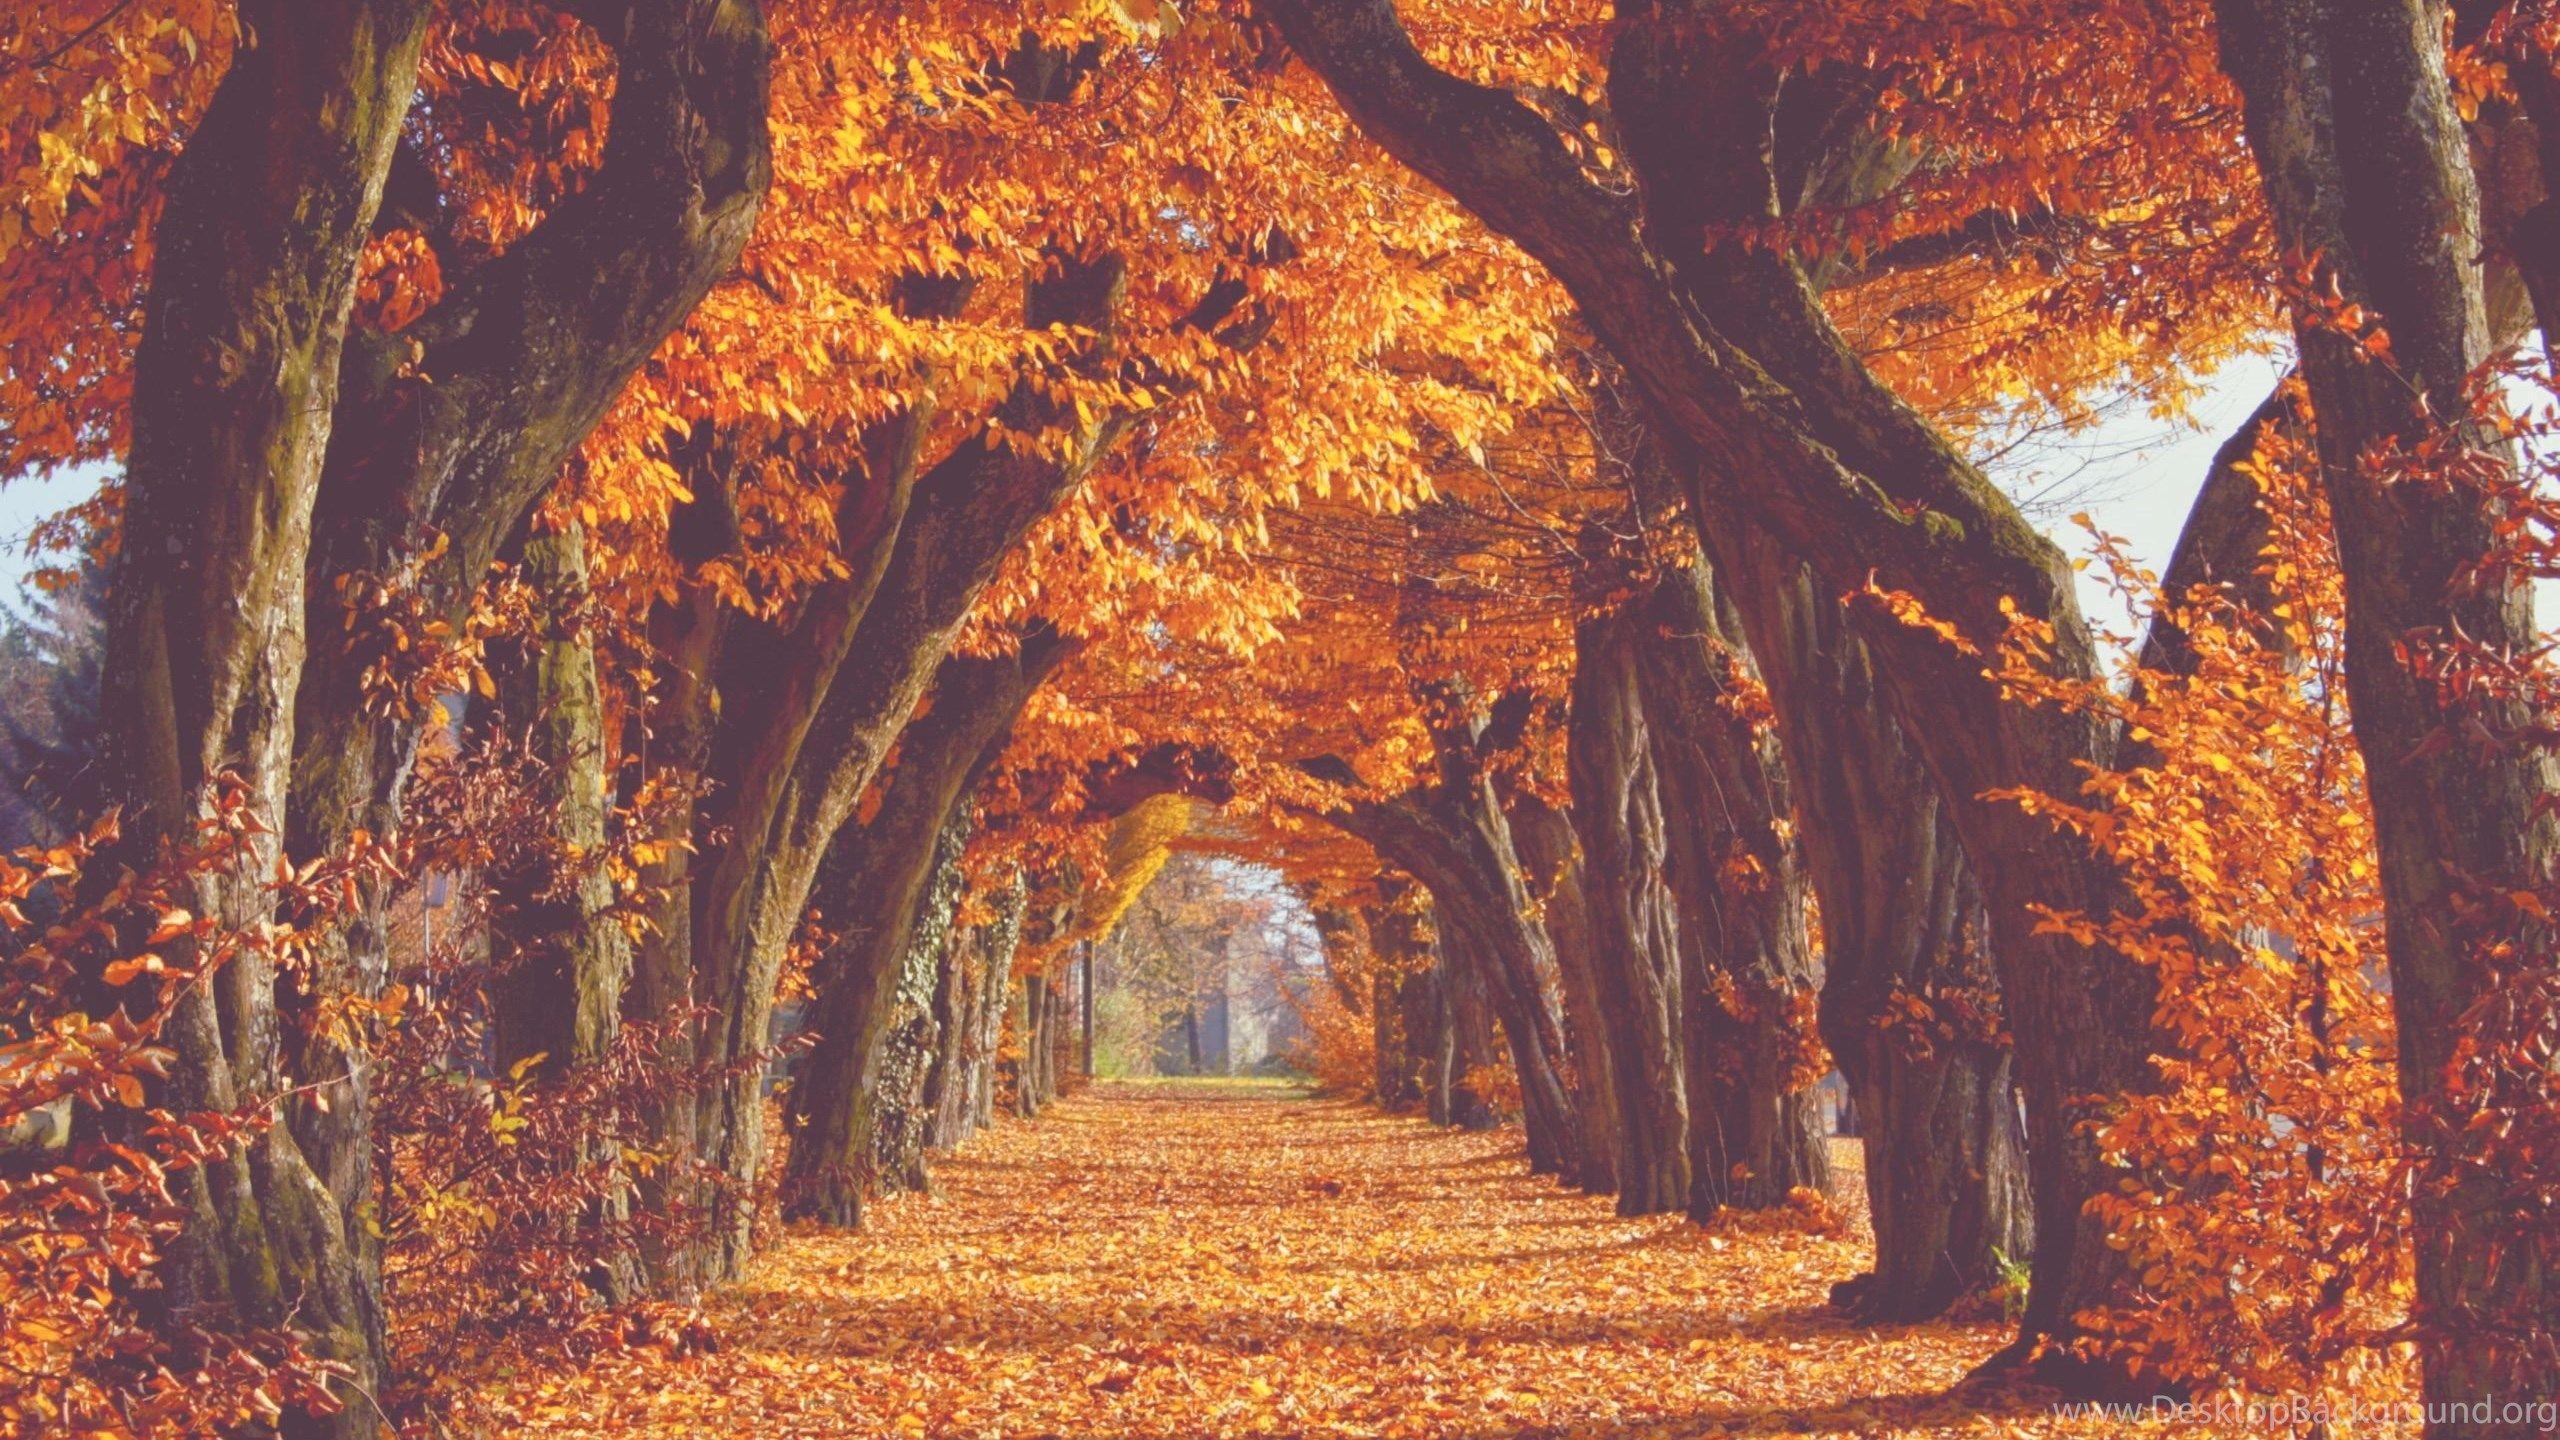 Tumblr Autumn Desktop Wallpapers Top Free Tumblr Autumn Desktop Backgrounds Wallpaperaccess